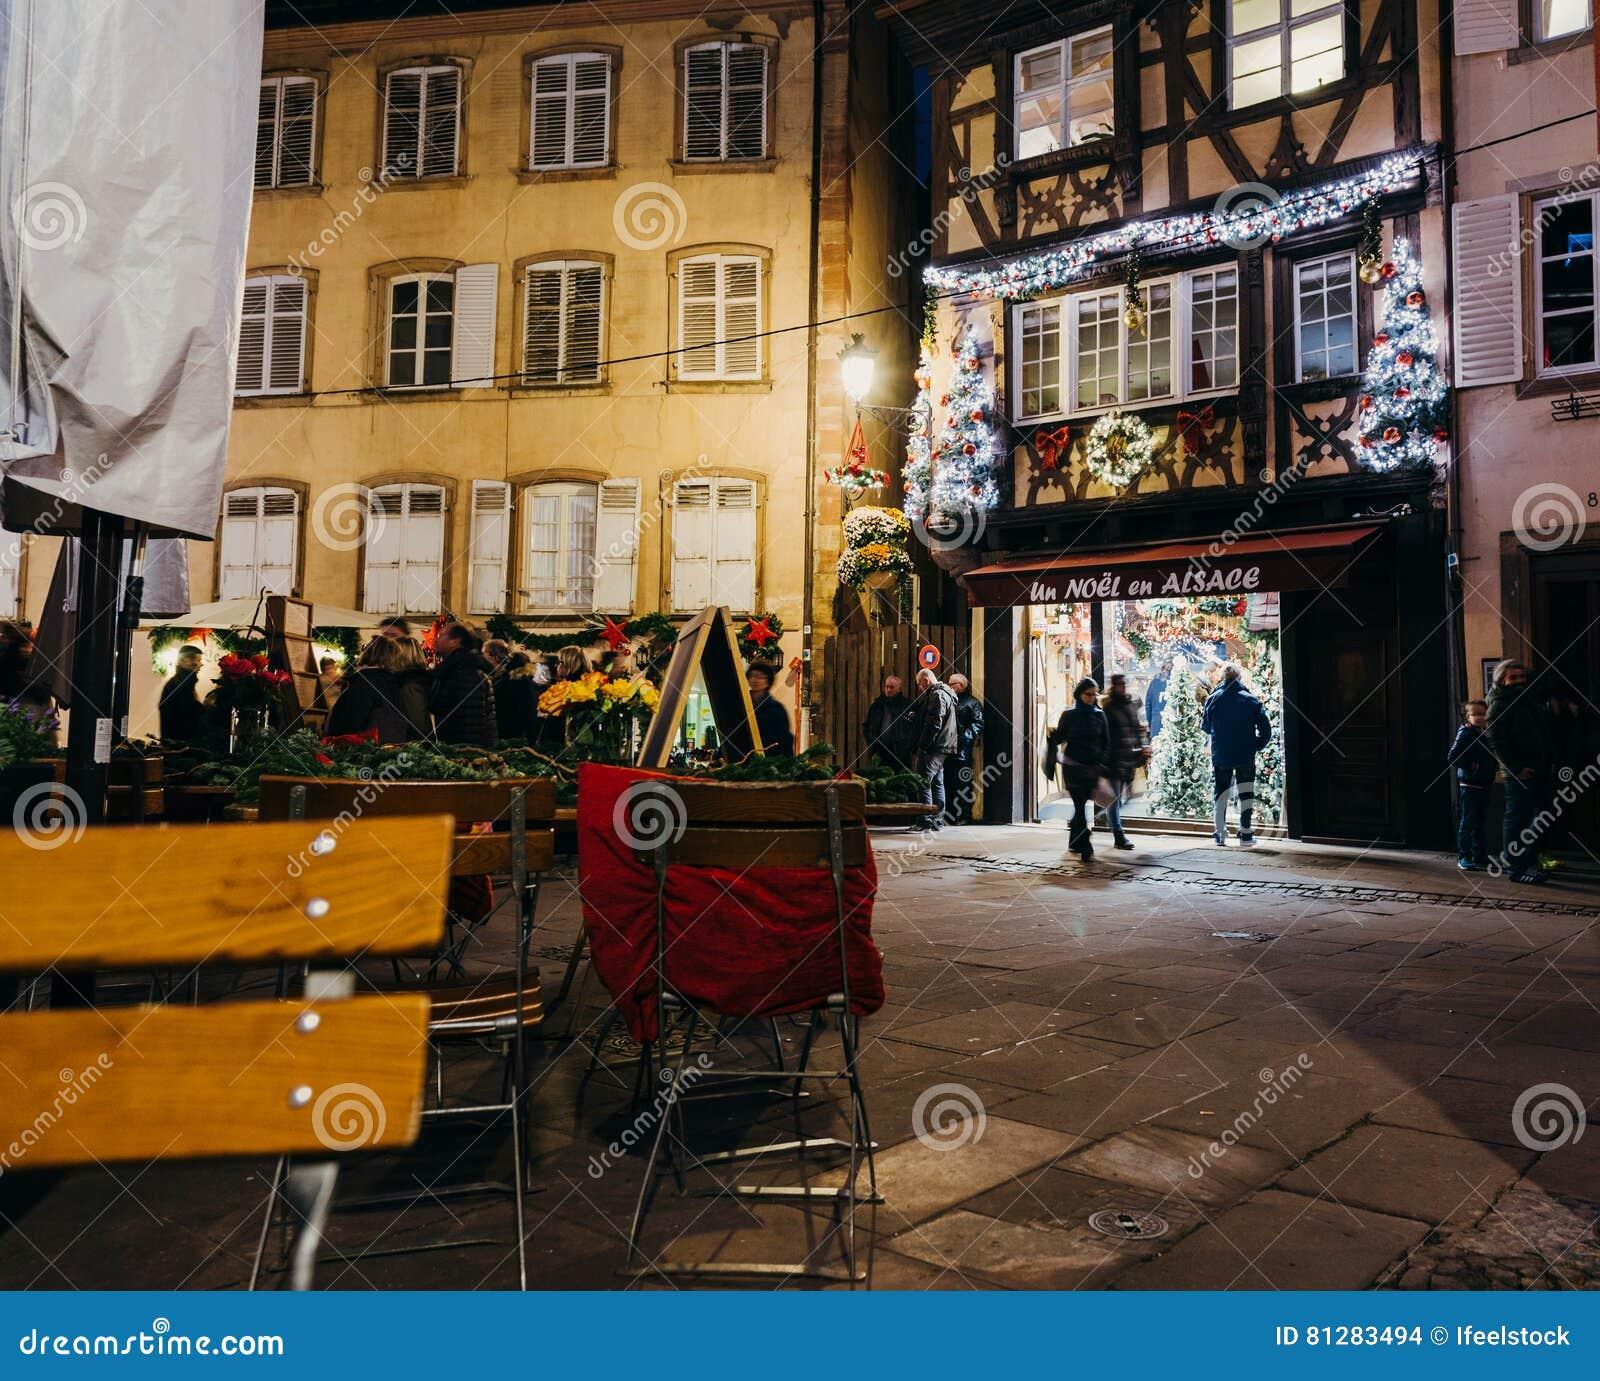 Un Noel En Alsace Traditional Shopping In Strasbourg With Custom ...